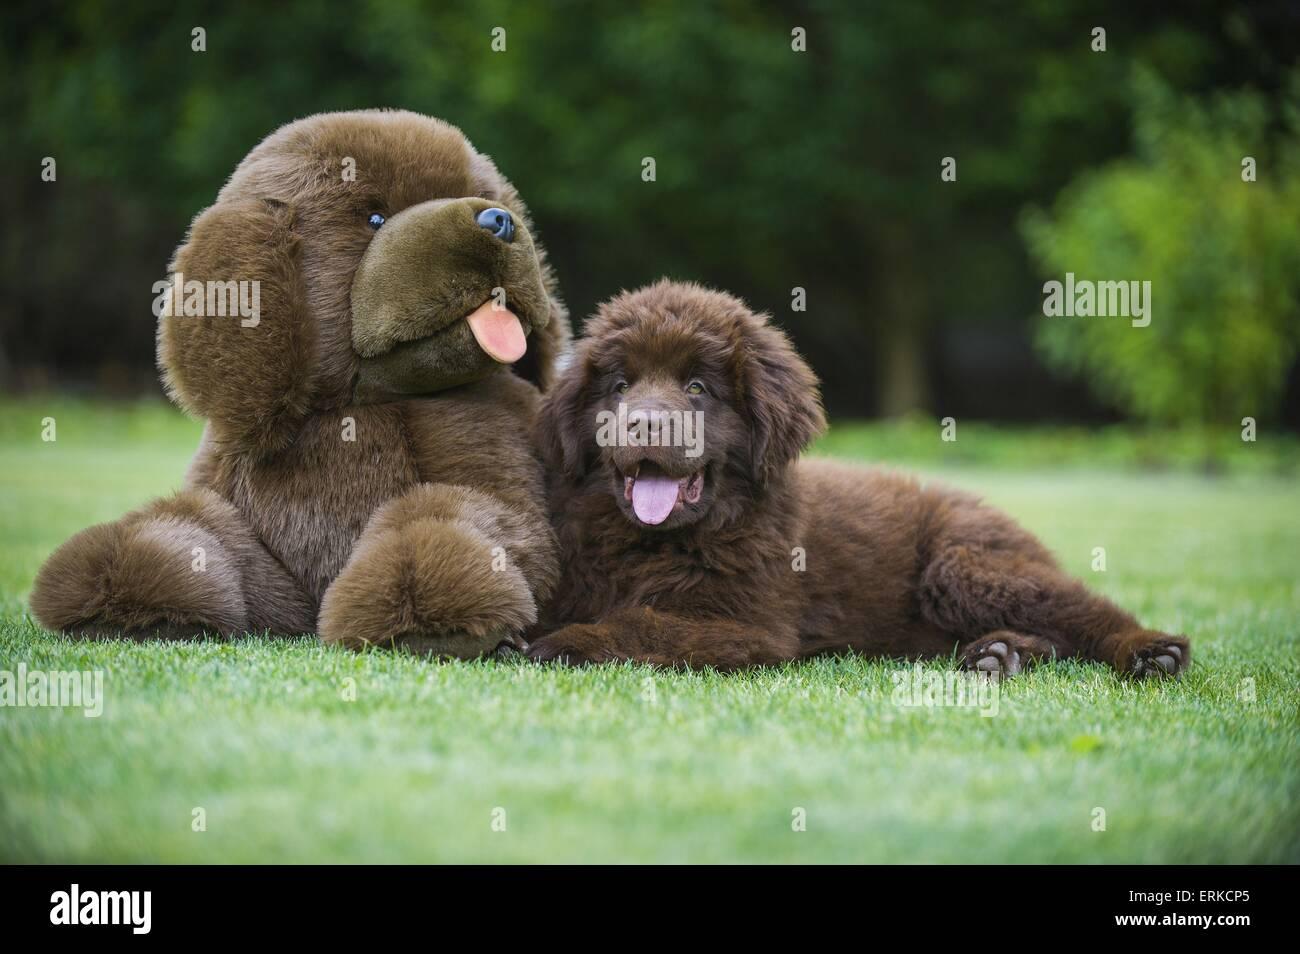 Soft Cuddly Dog Toys Stock Photos Soft Cuddly Dog Toys